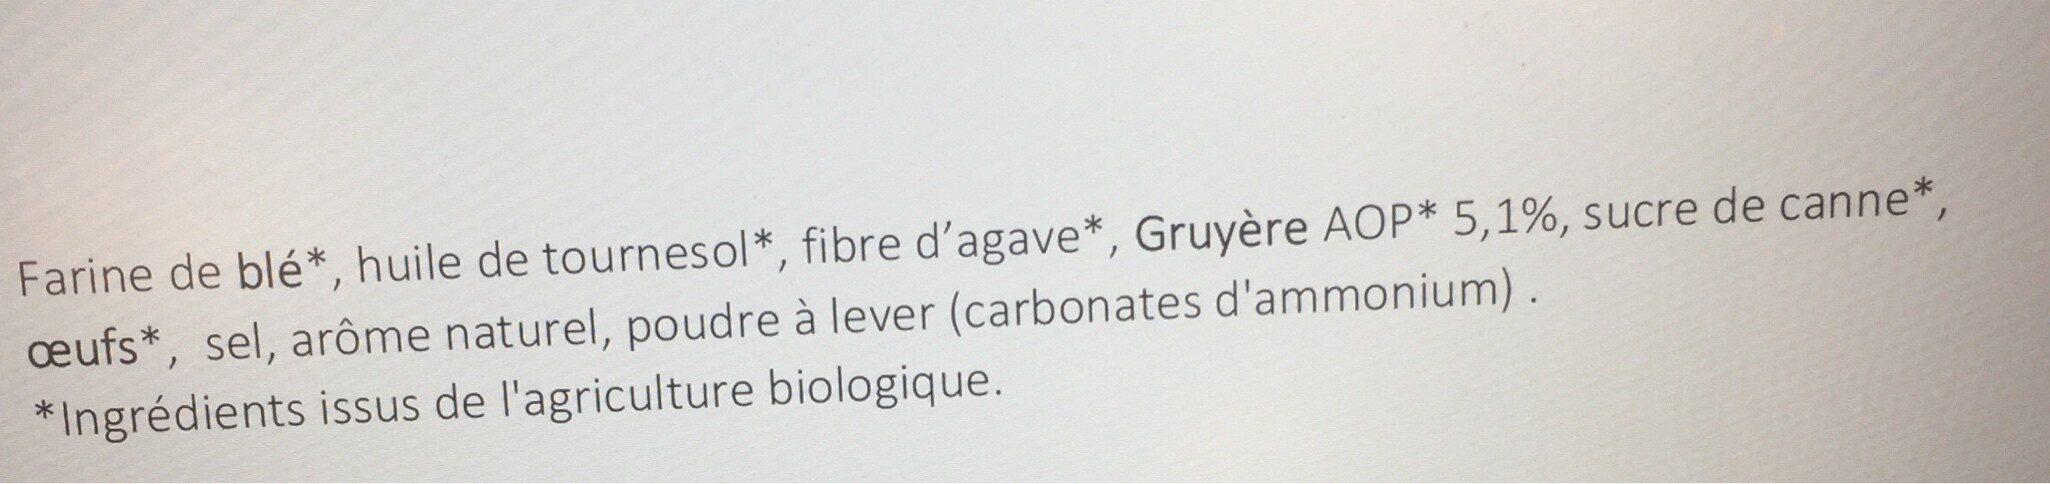 Test tortillon gruyere - Ingredients - fr